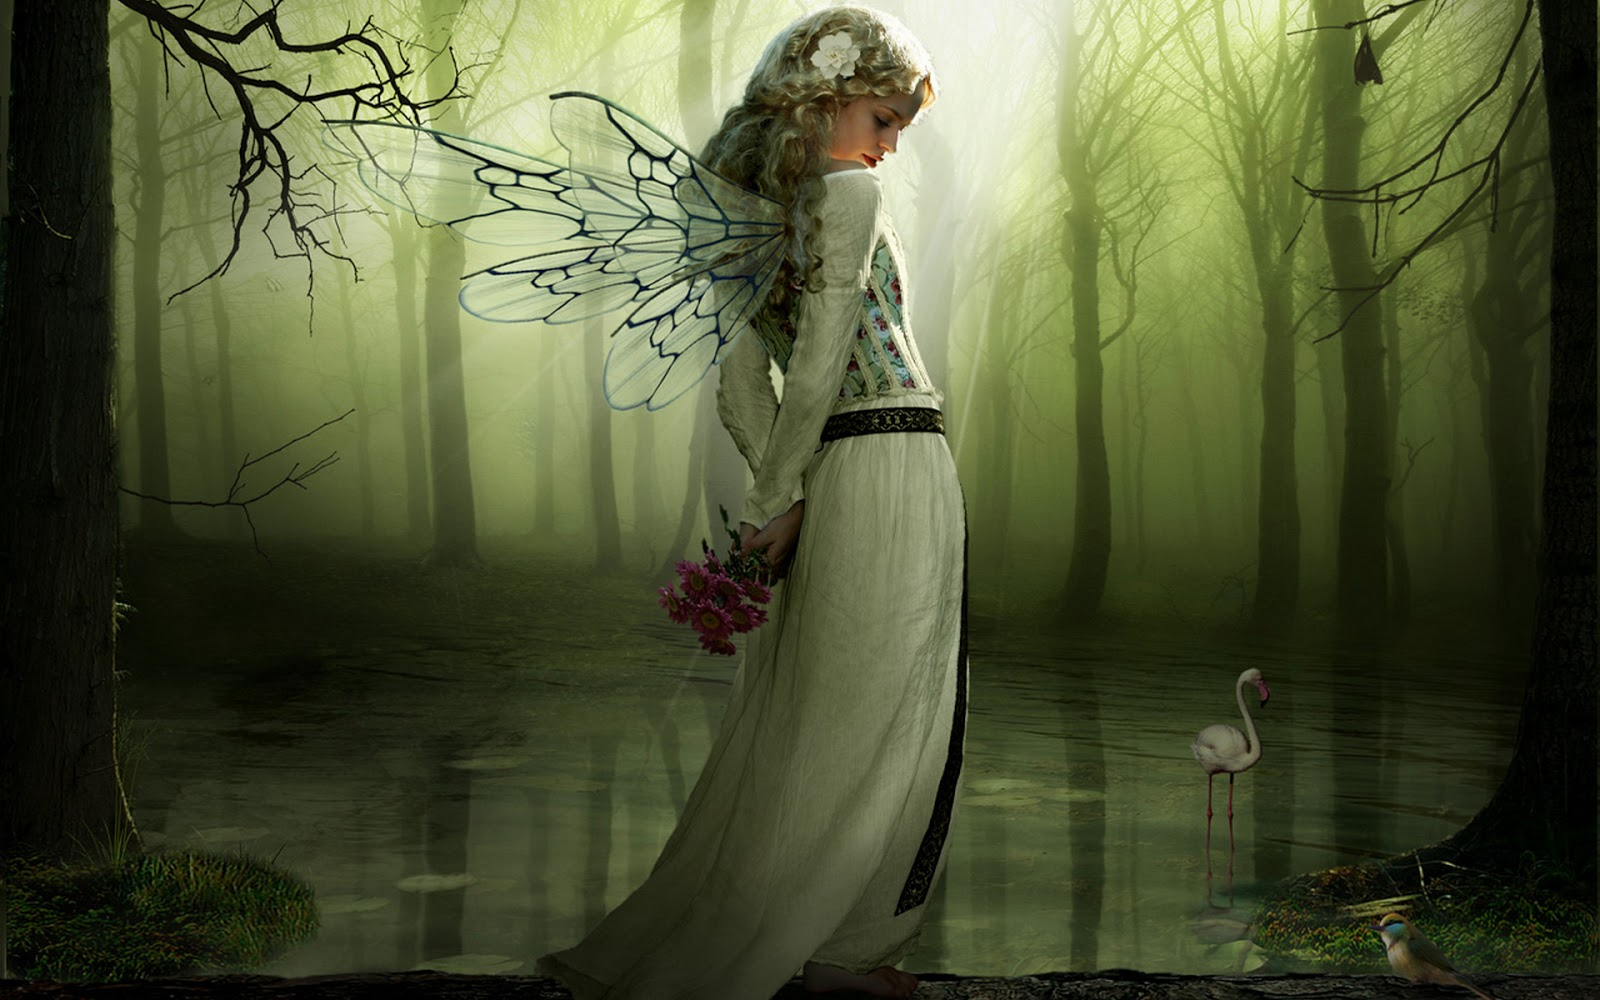 http://3.bp.blogspot.com/-n2EvPl0jyZE/UIvC2j1UNgI/AAAAAAAAE7k/3tL3qRHfkXM/s1600/Green+Angel+1900x1200+Photoshop+wallpaper.jpg